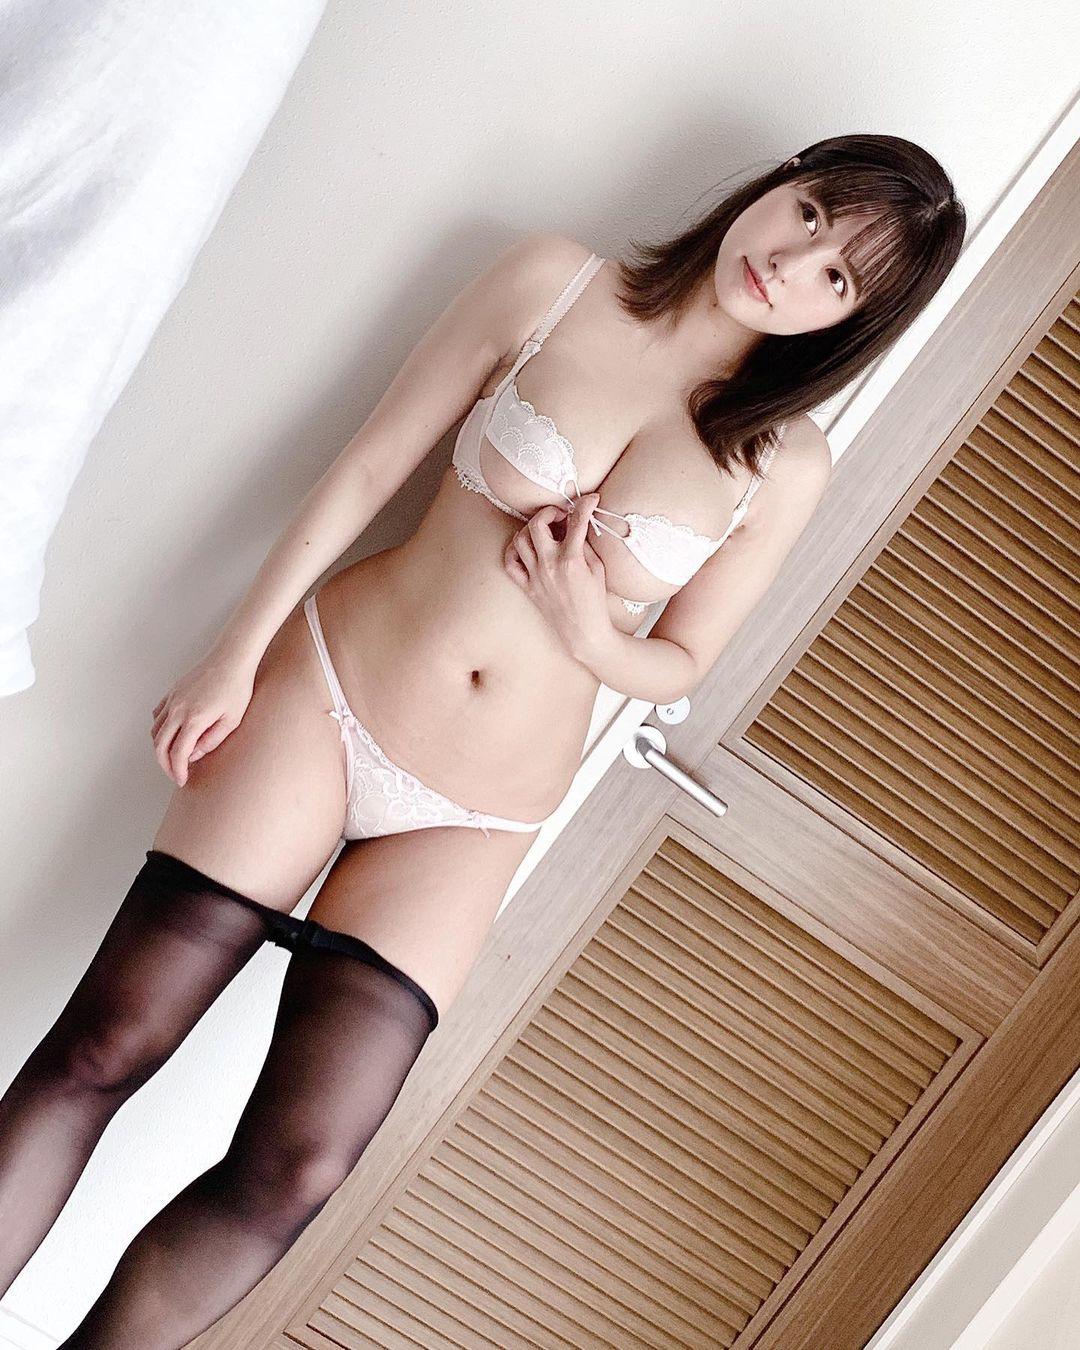 vanessa_pan199.jpg